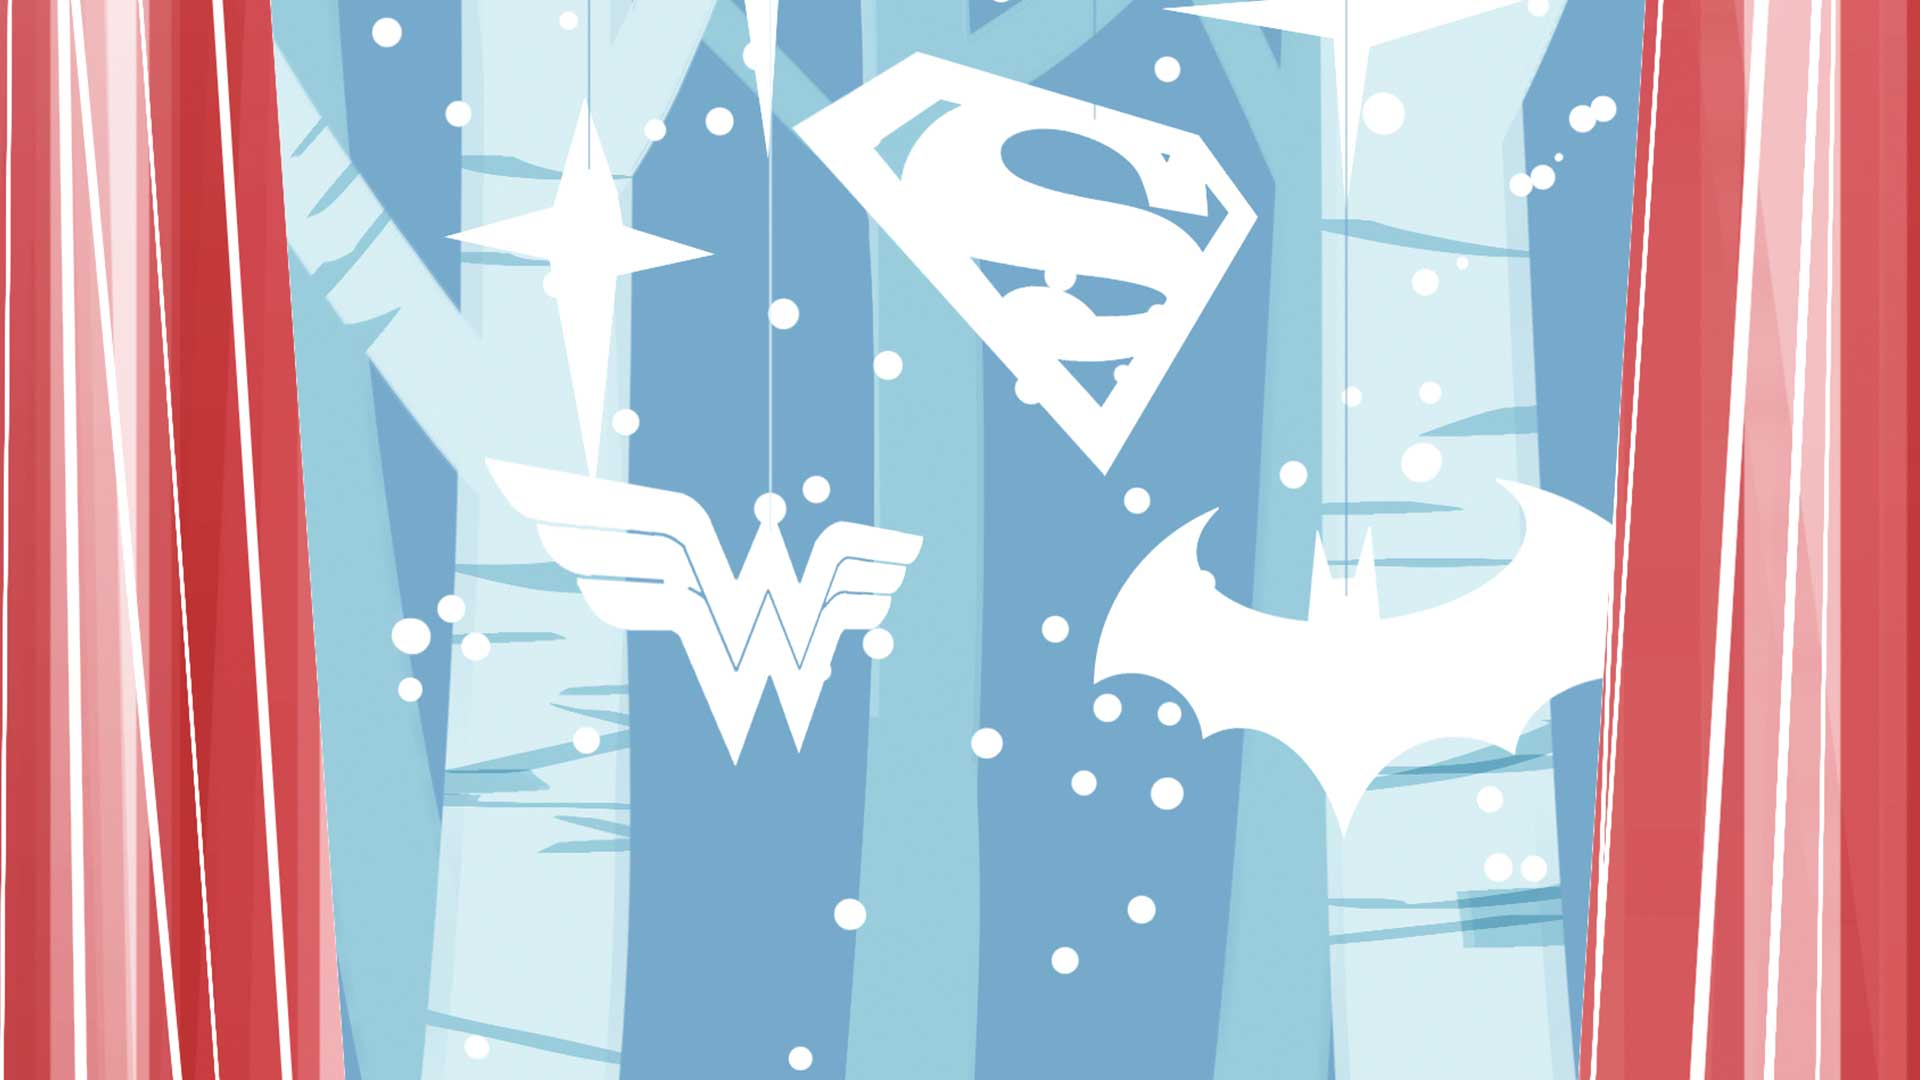 dc-comics-rebirth-holiday-special